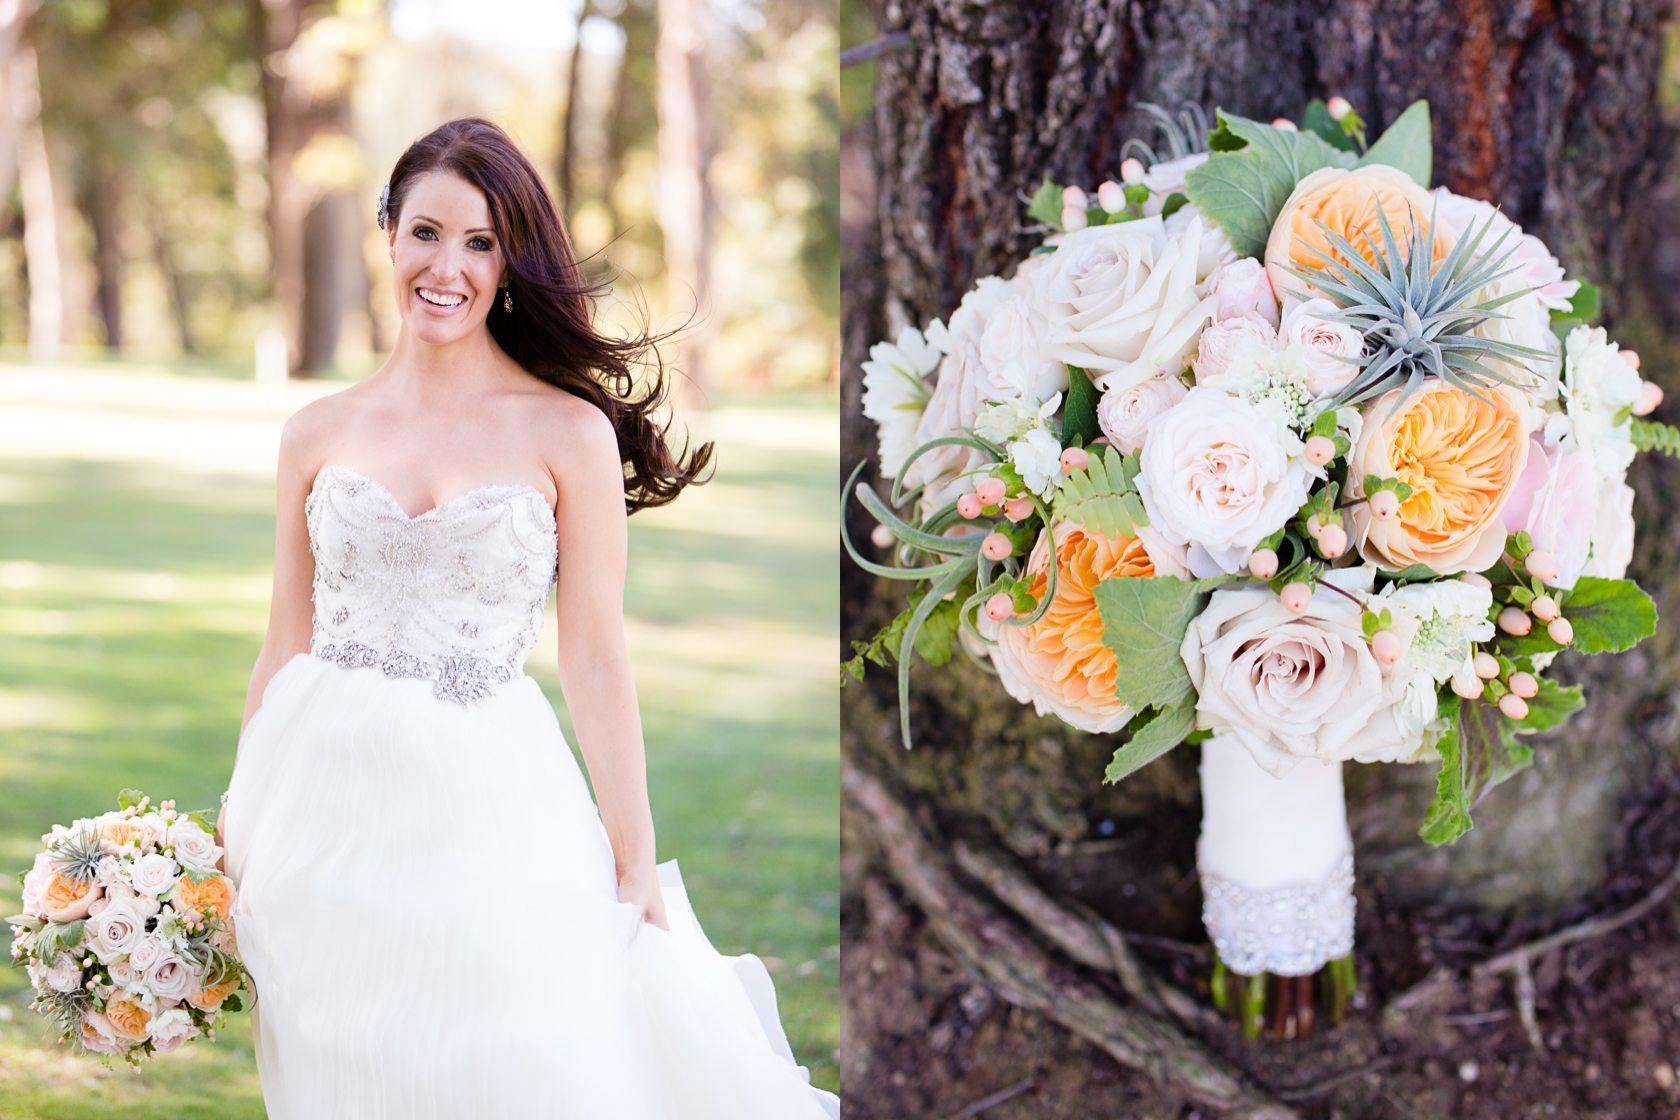 Temecula_Creek_Inn_Wedding_043.jpg